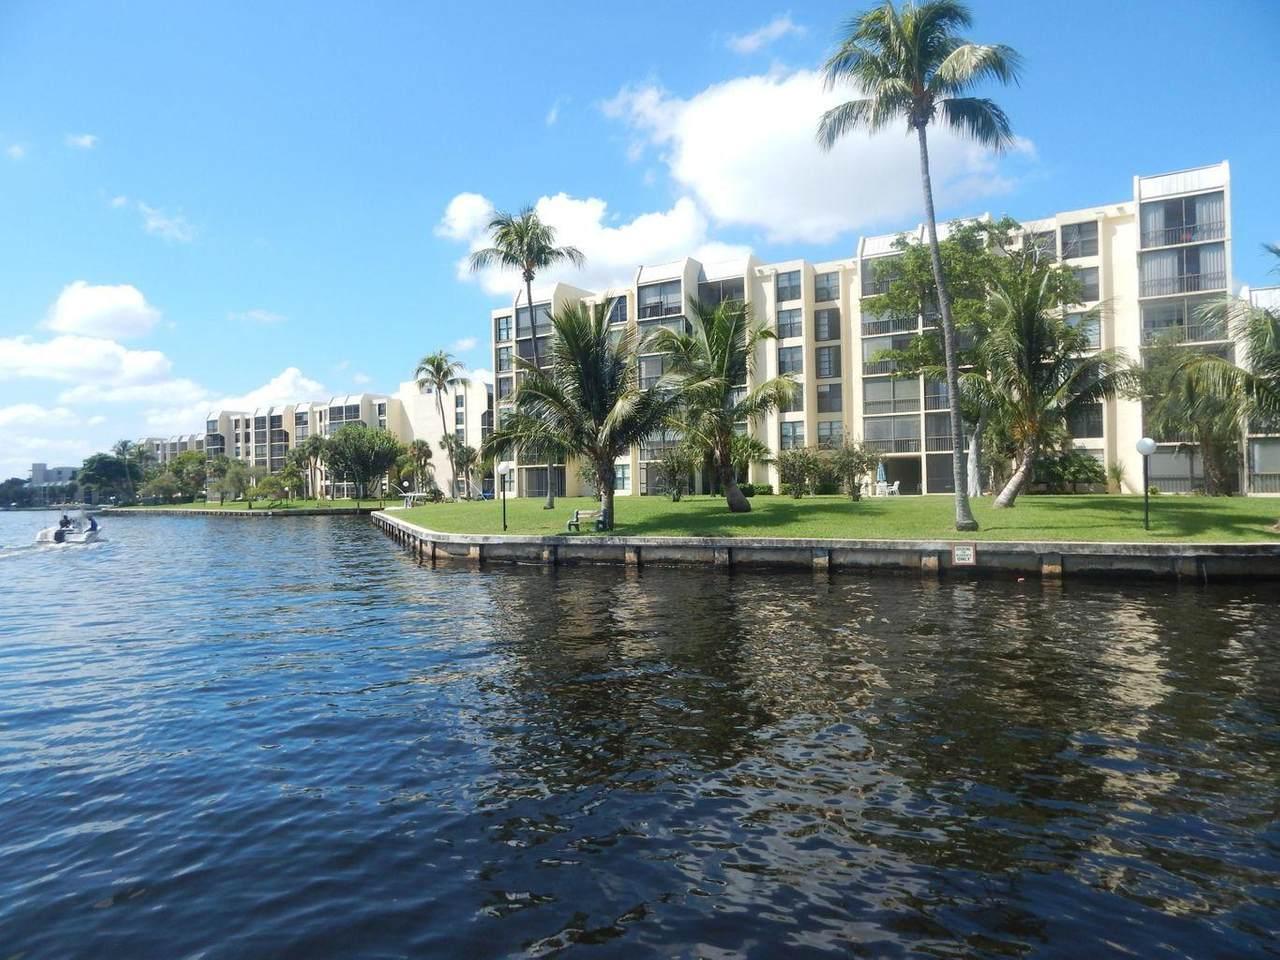 6 Royal Palm Way - Photo 1